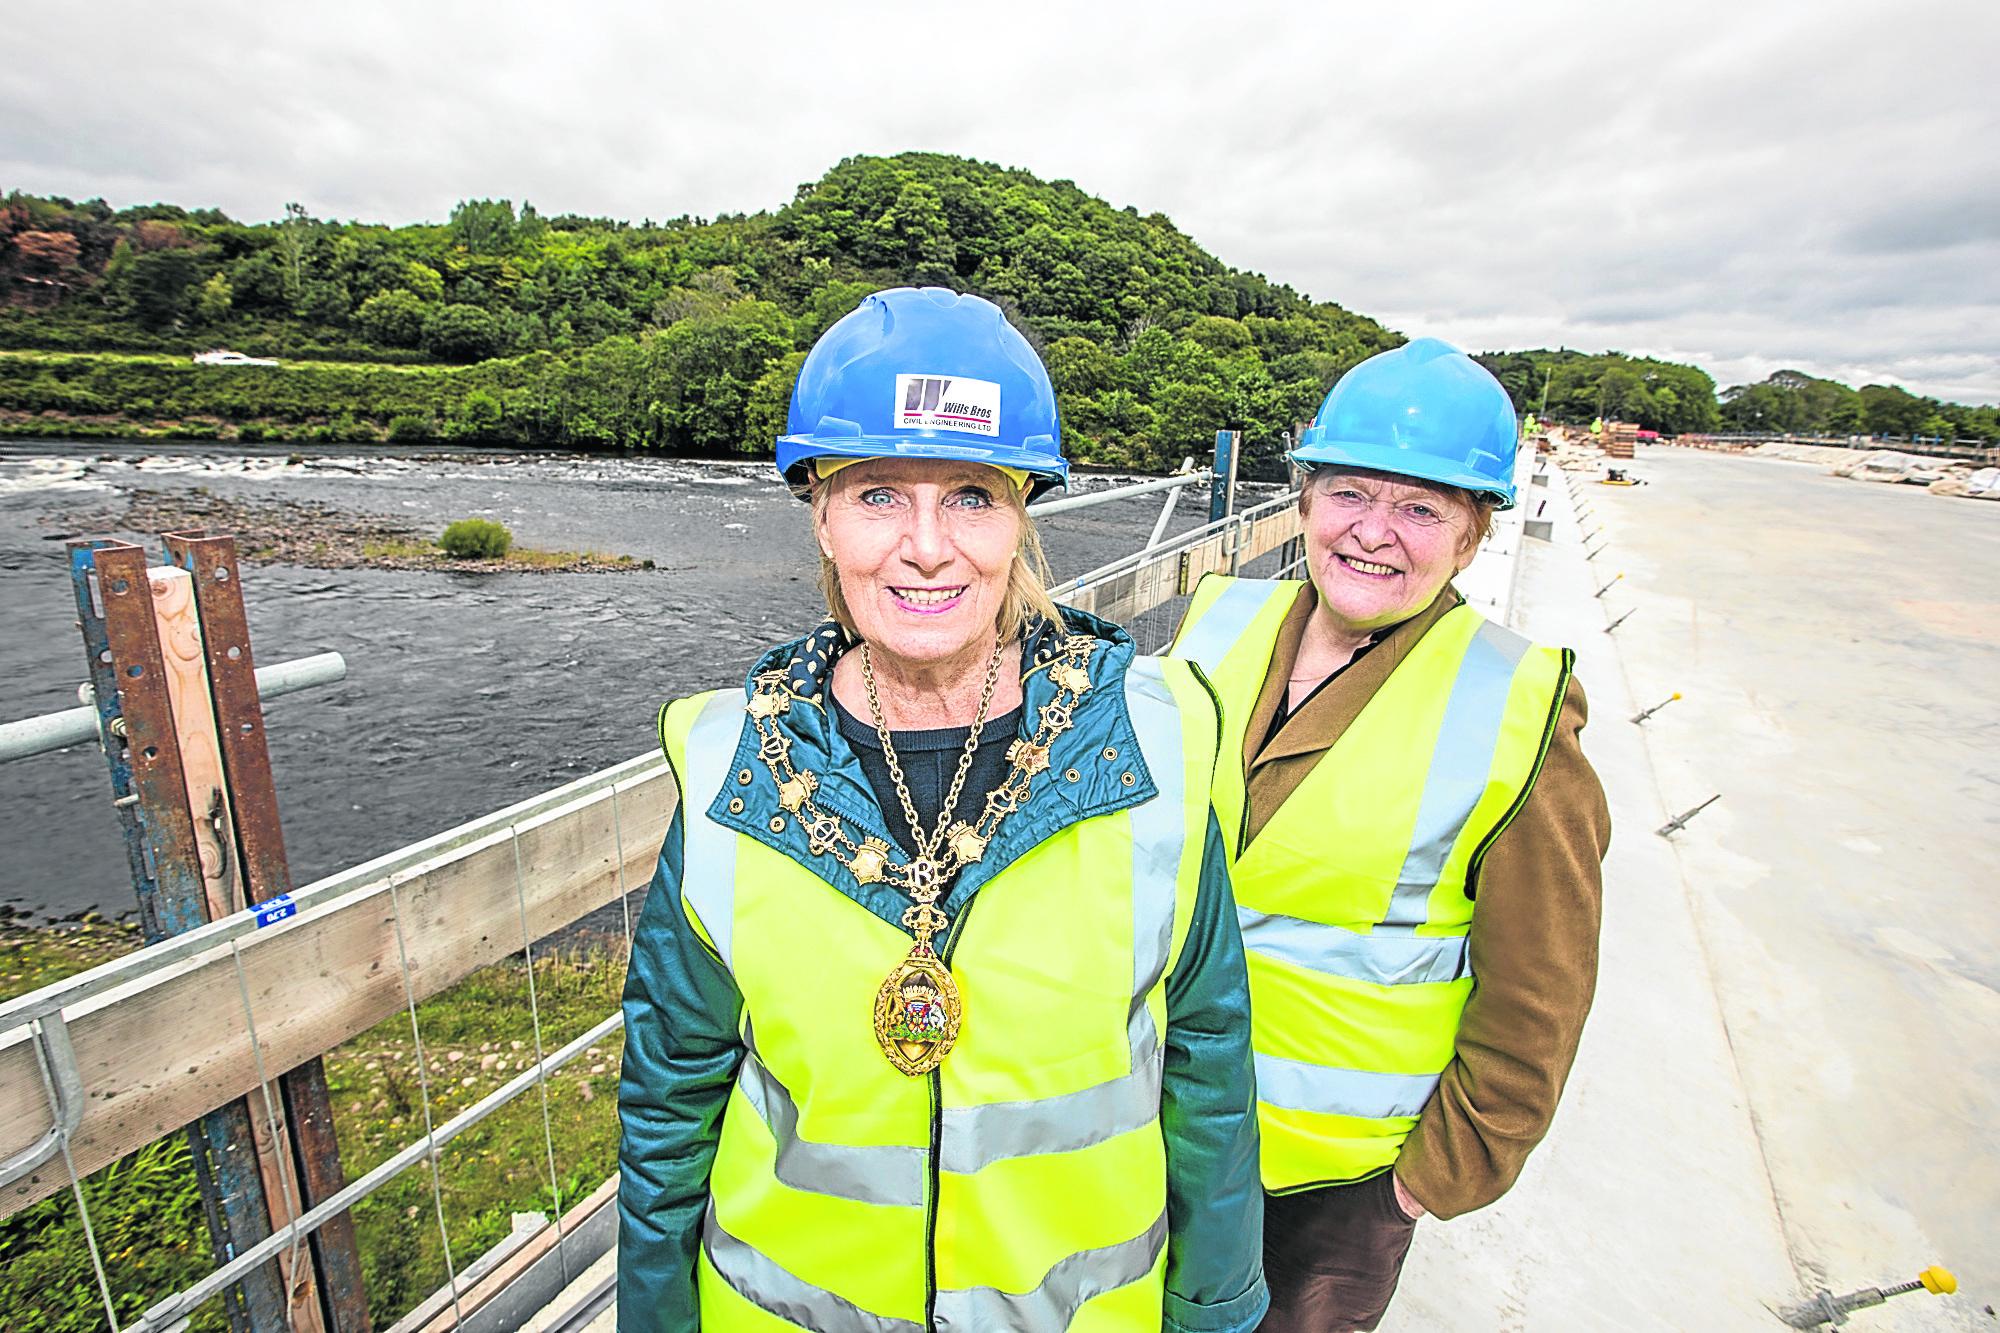 Provost of Inverness Helen Carmichael and Council Leader Margaret Davidson